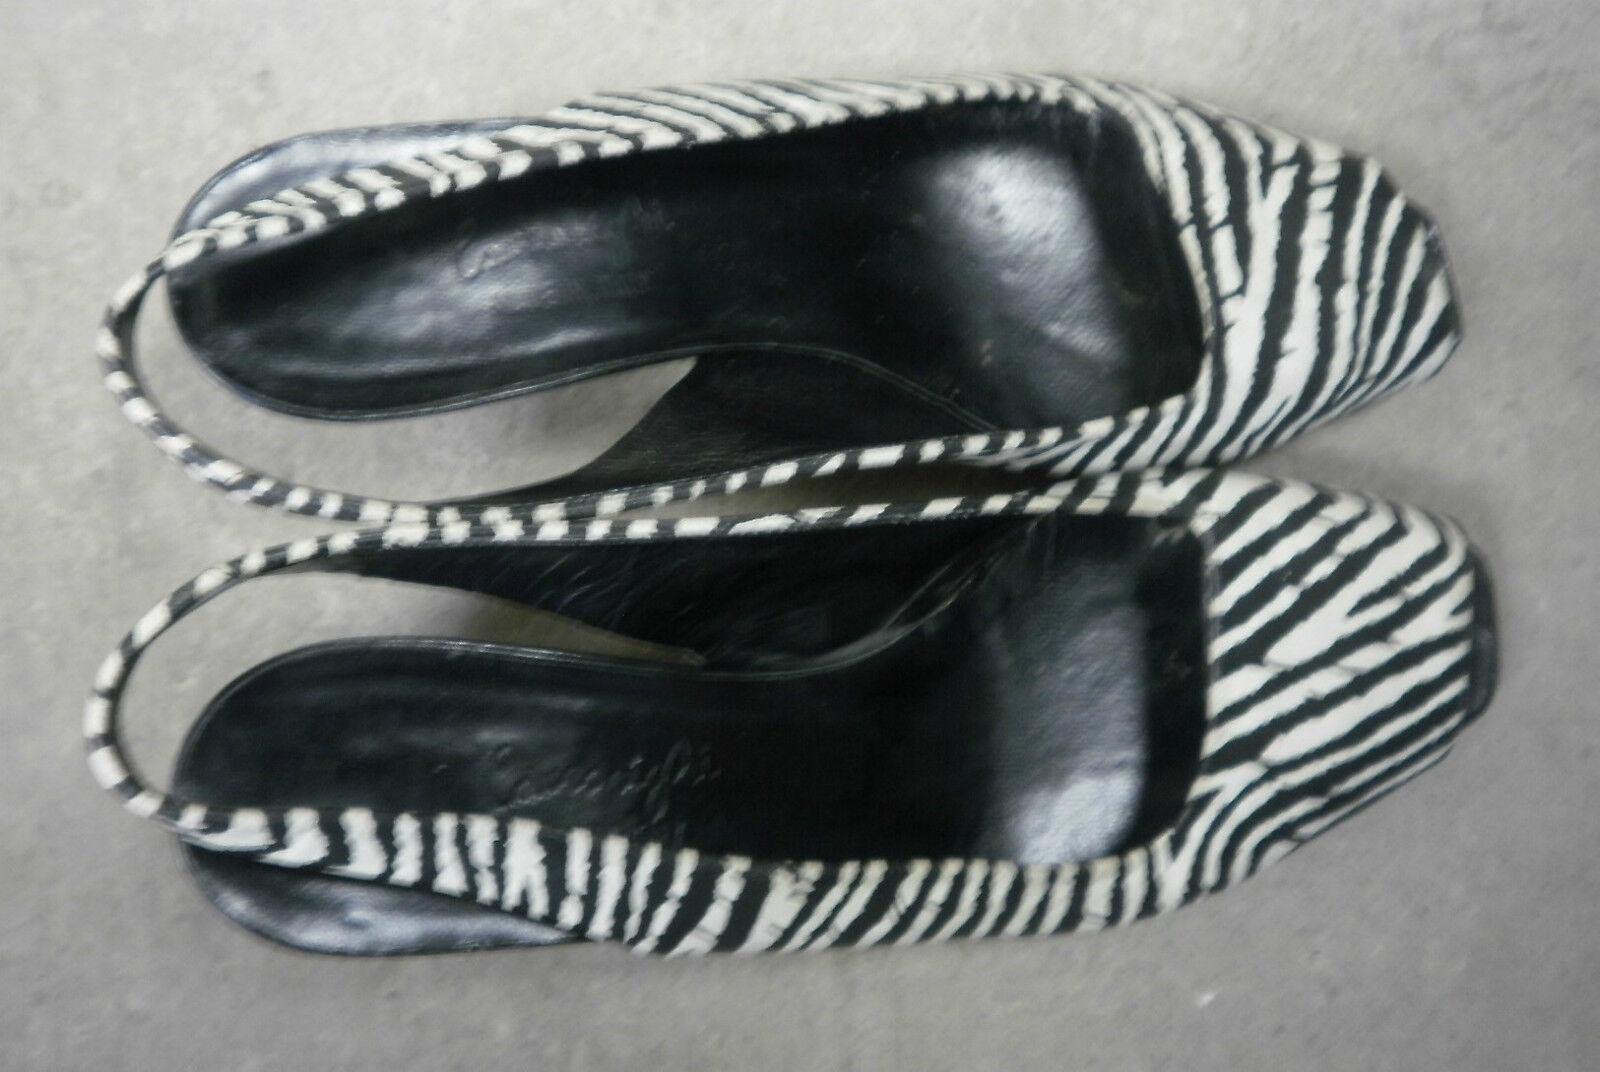 lauro 80er righi Peeptoe Damen Pumps made italy 80er lauro TRUE VINTAGE Sandalette Schuhe 290de4